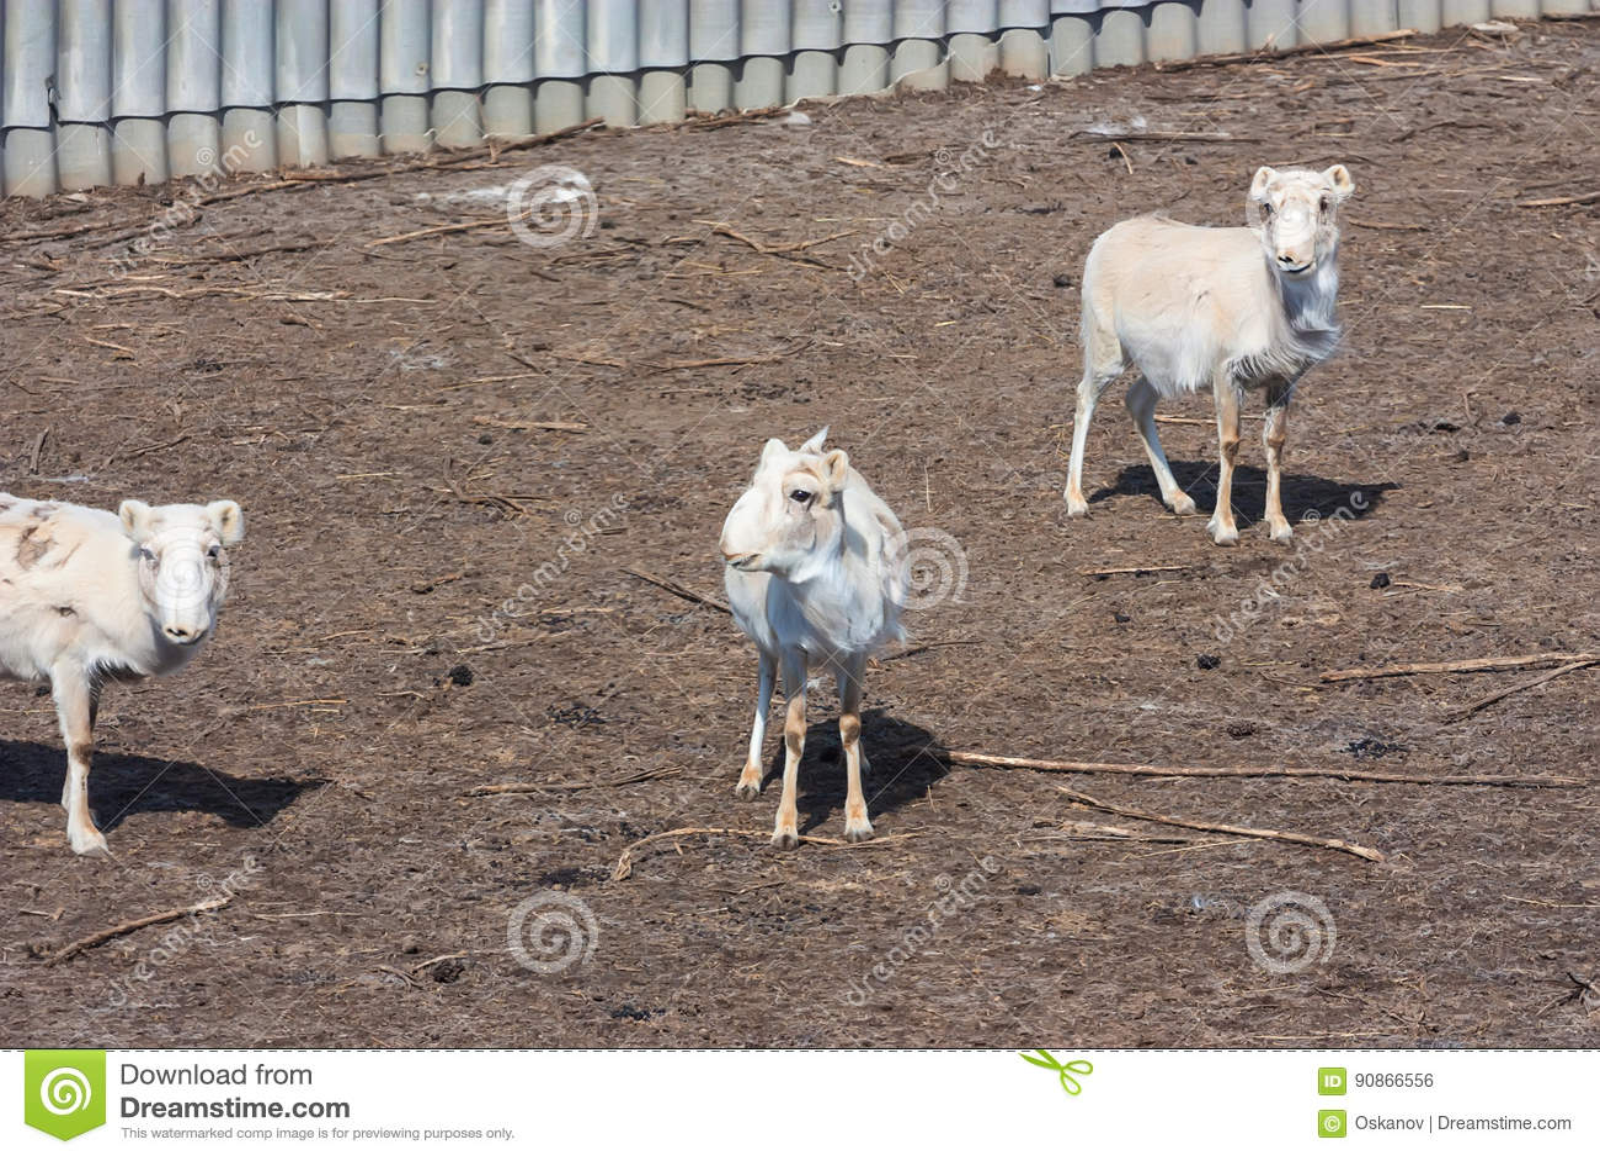 Russian antelope or Saiga tatarica